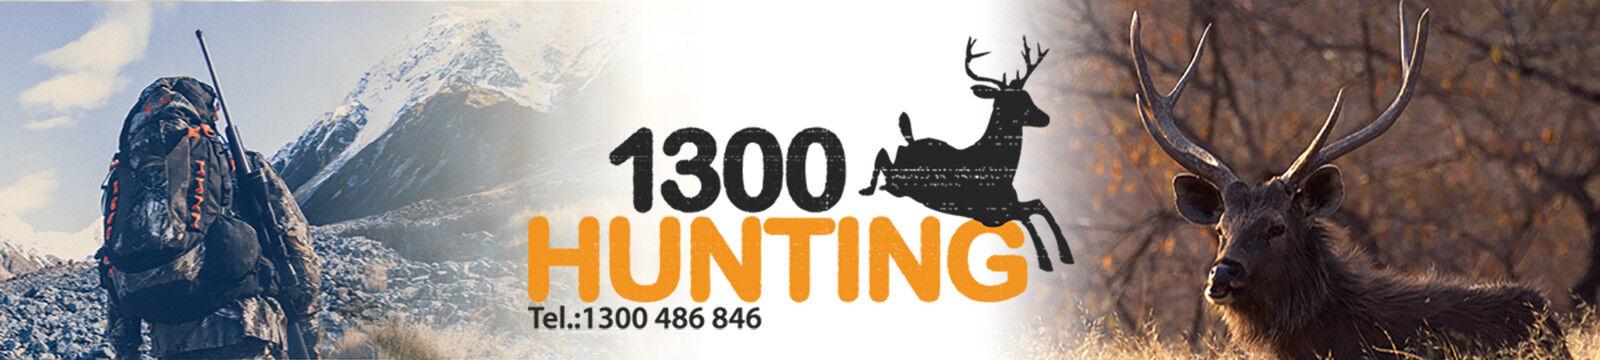 1300hunting